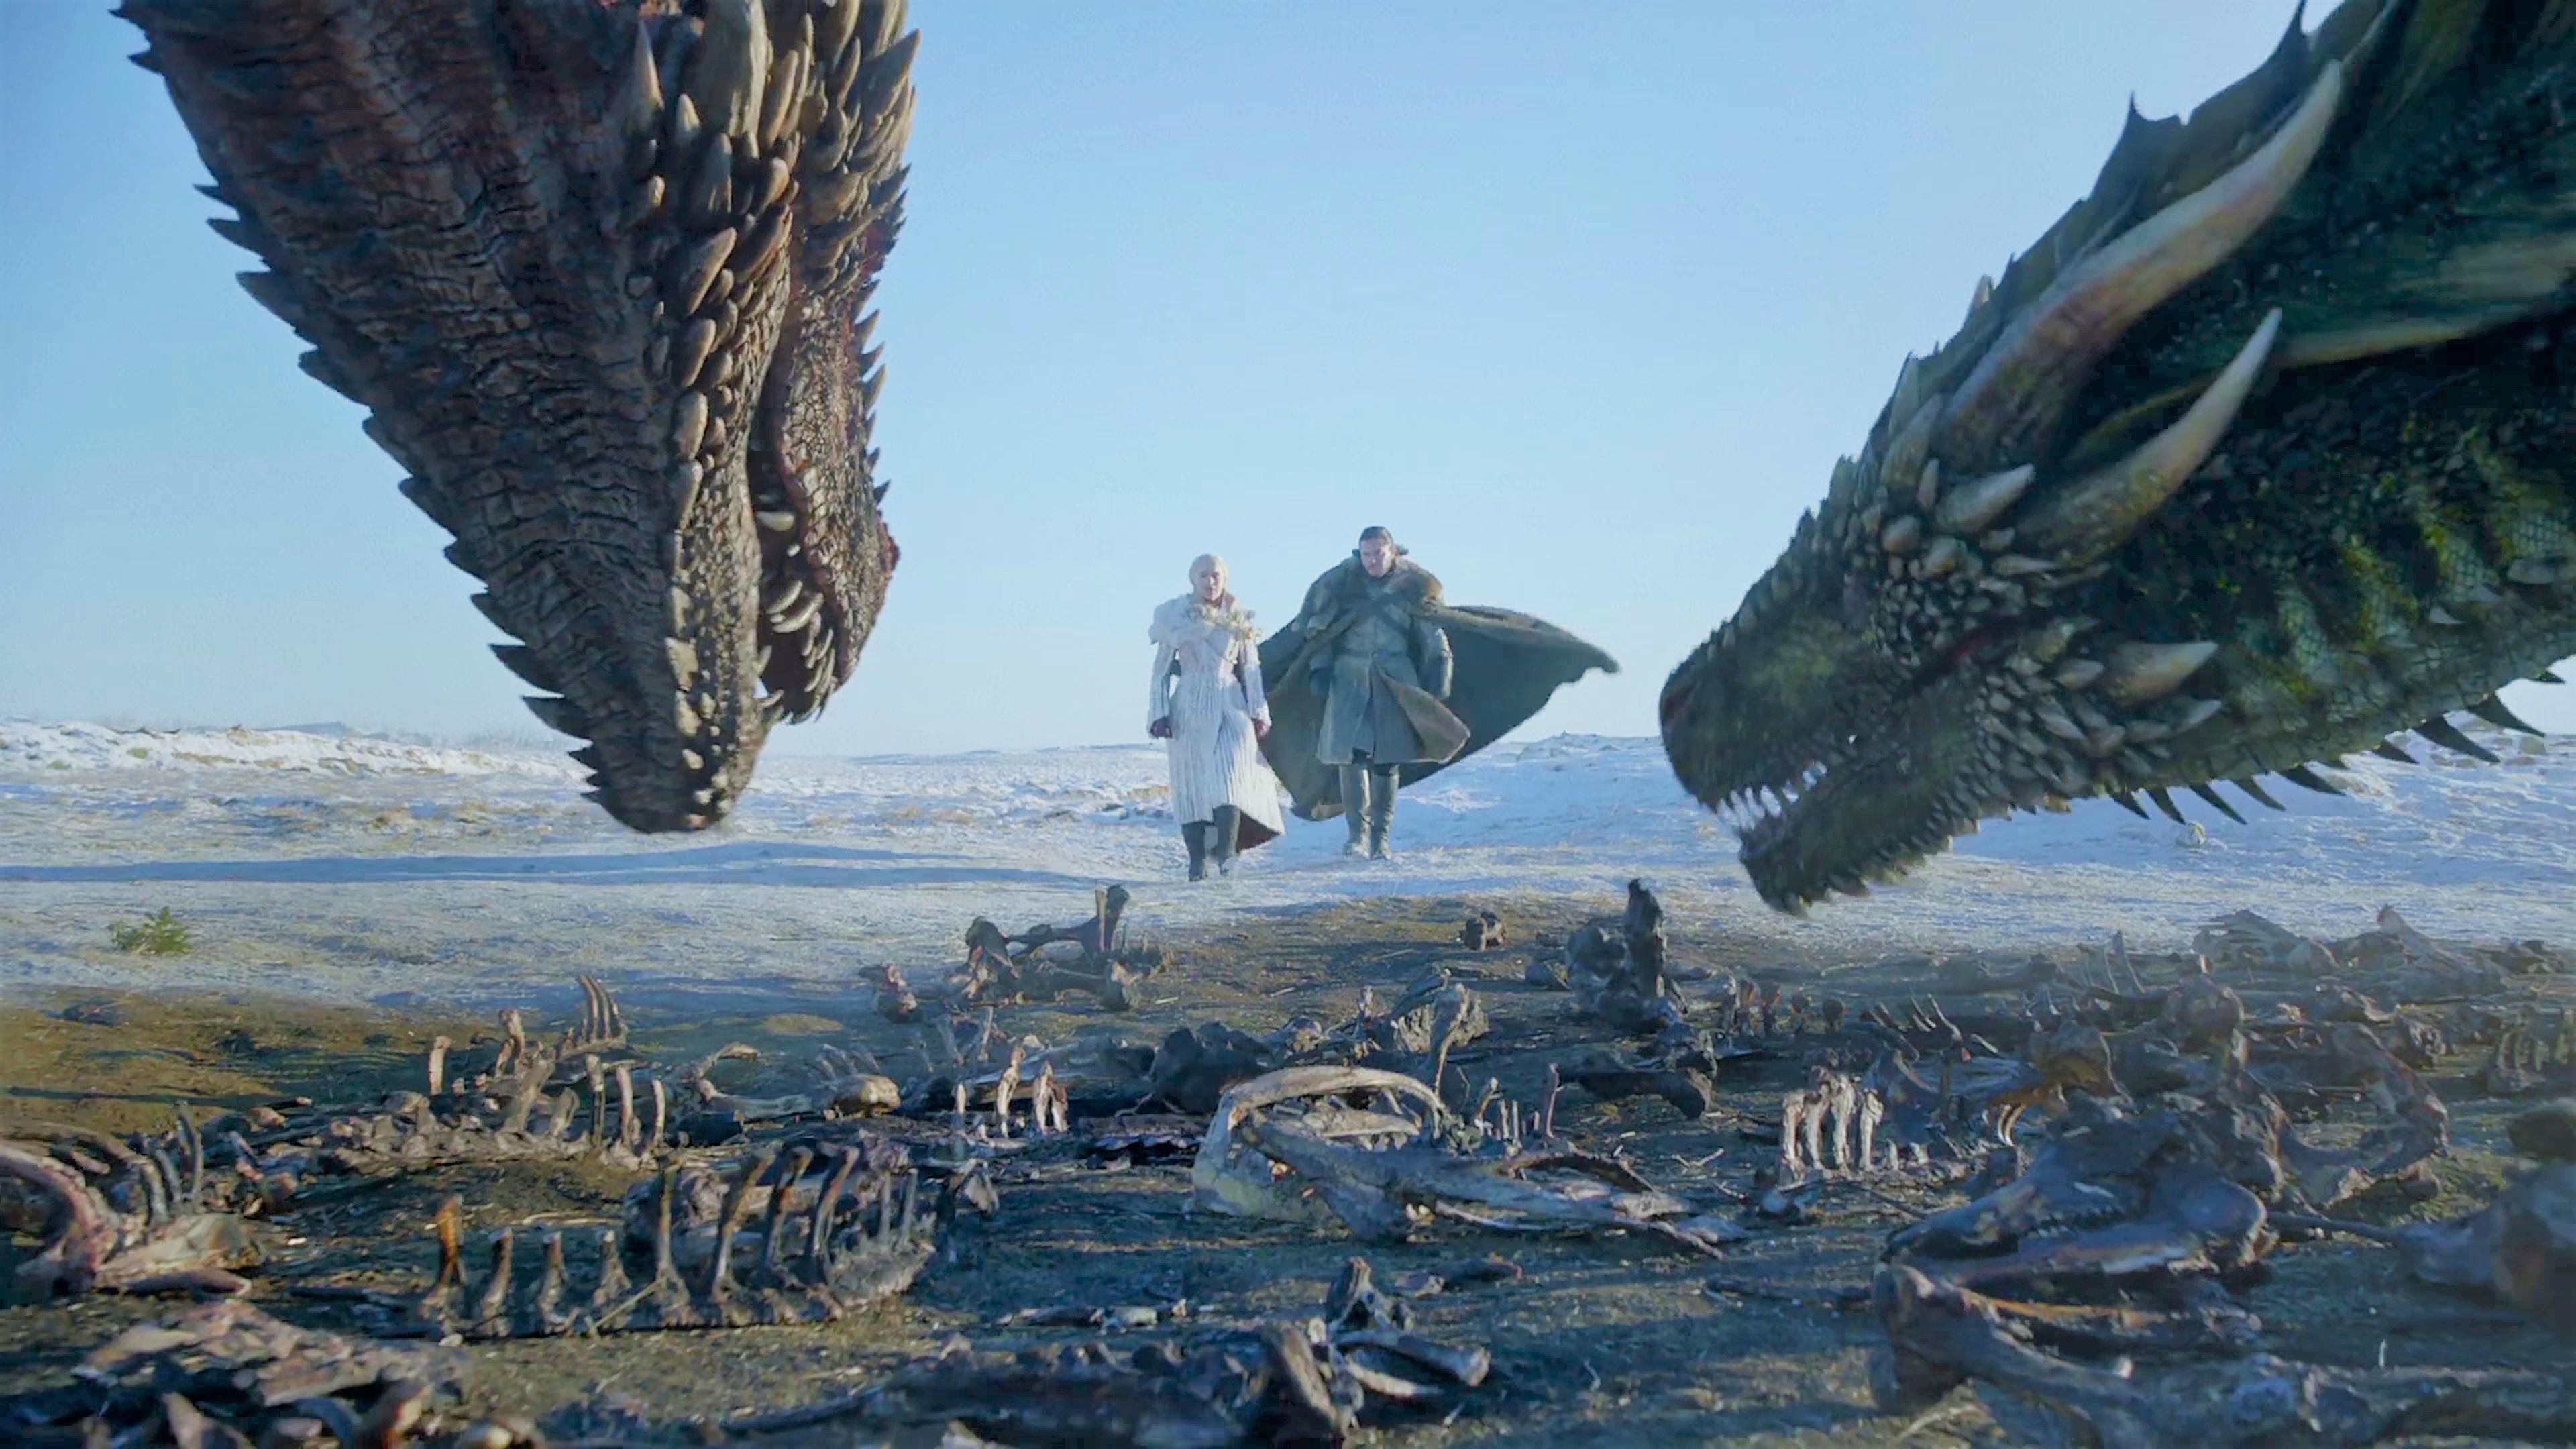 38. Season 8 Trailer Jon Snow Daenerys Targaryen Drogon Viserion 1